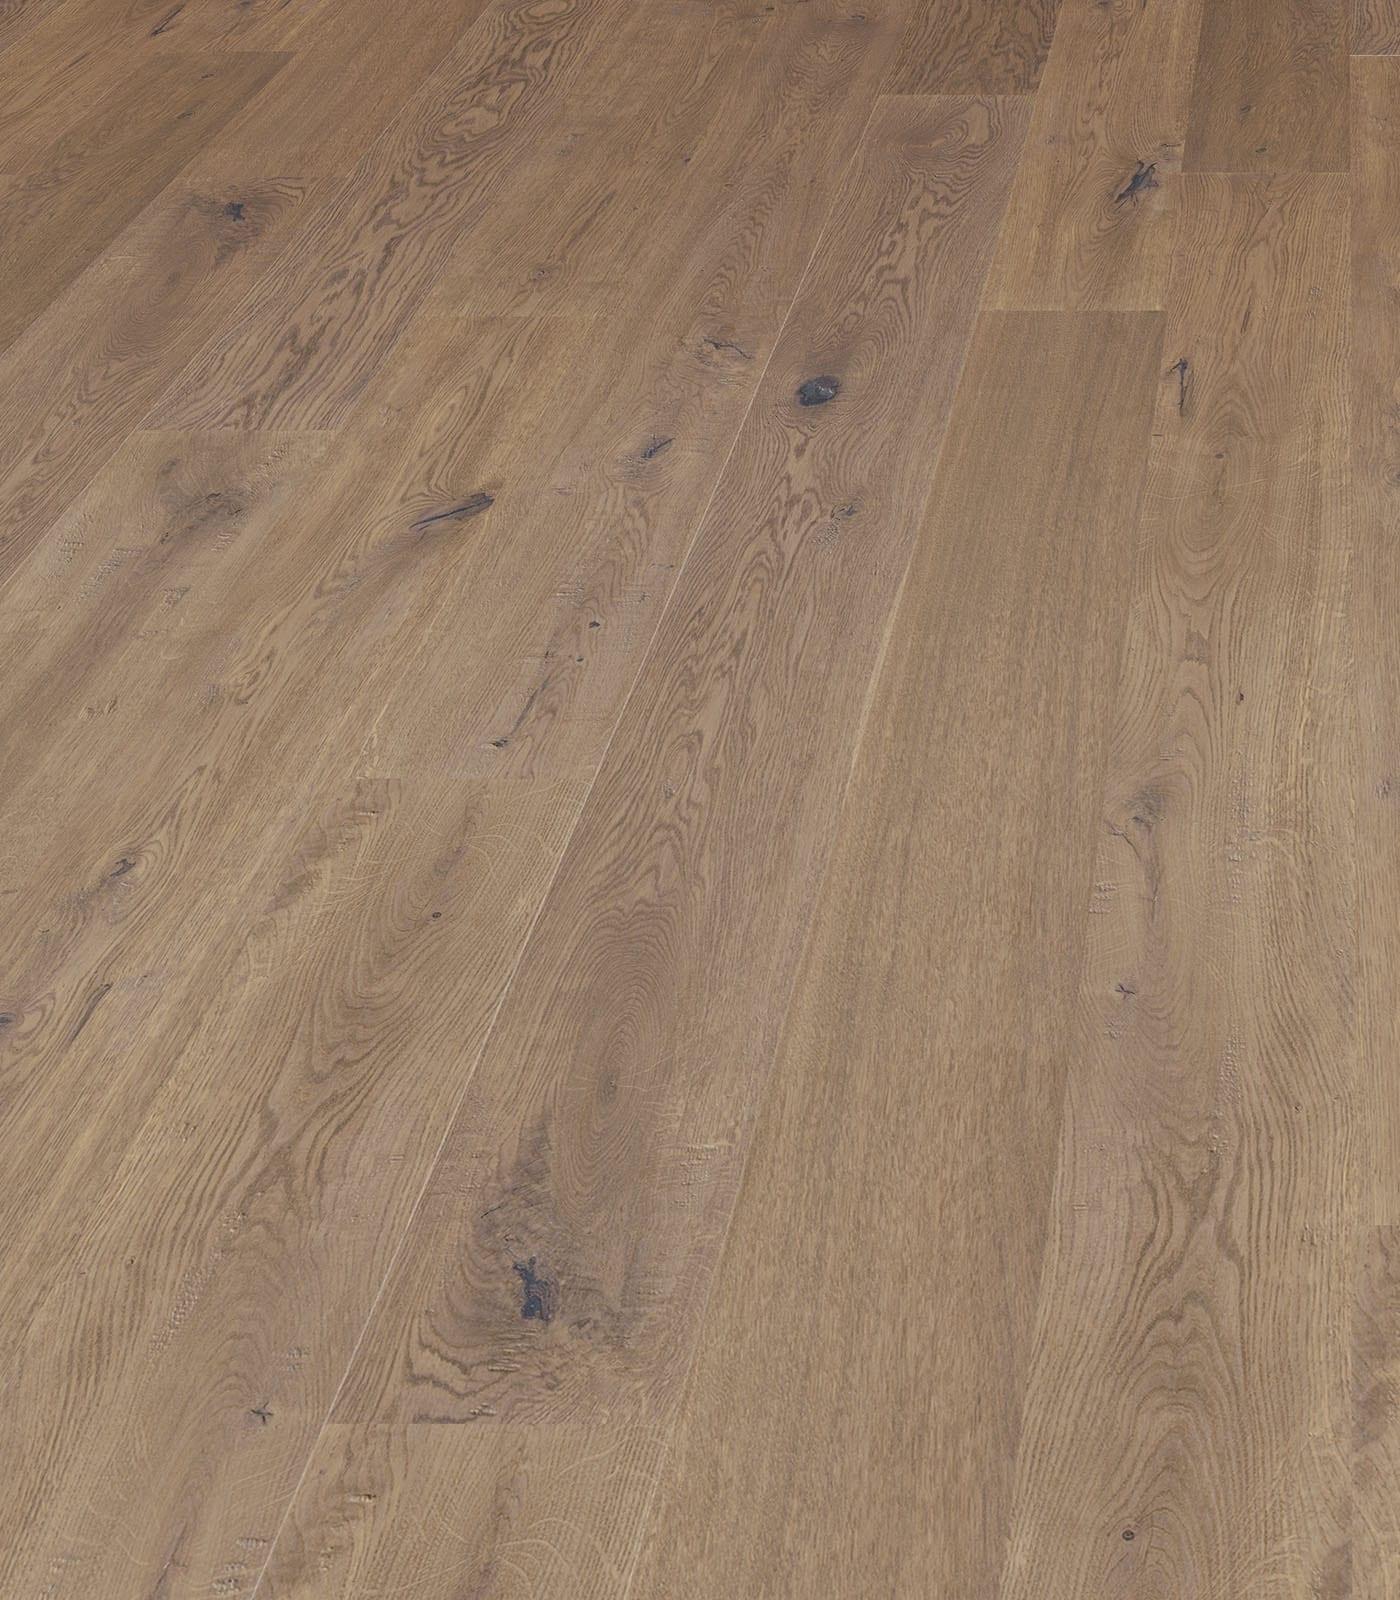 Rossel-Antique Collection-European Oak Floors-angle